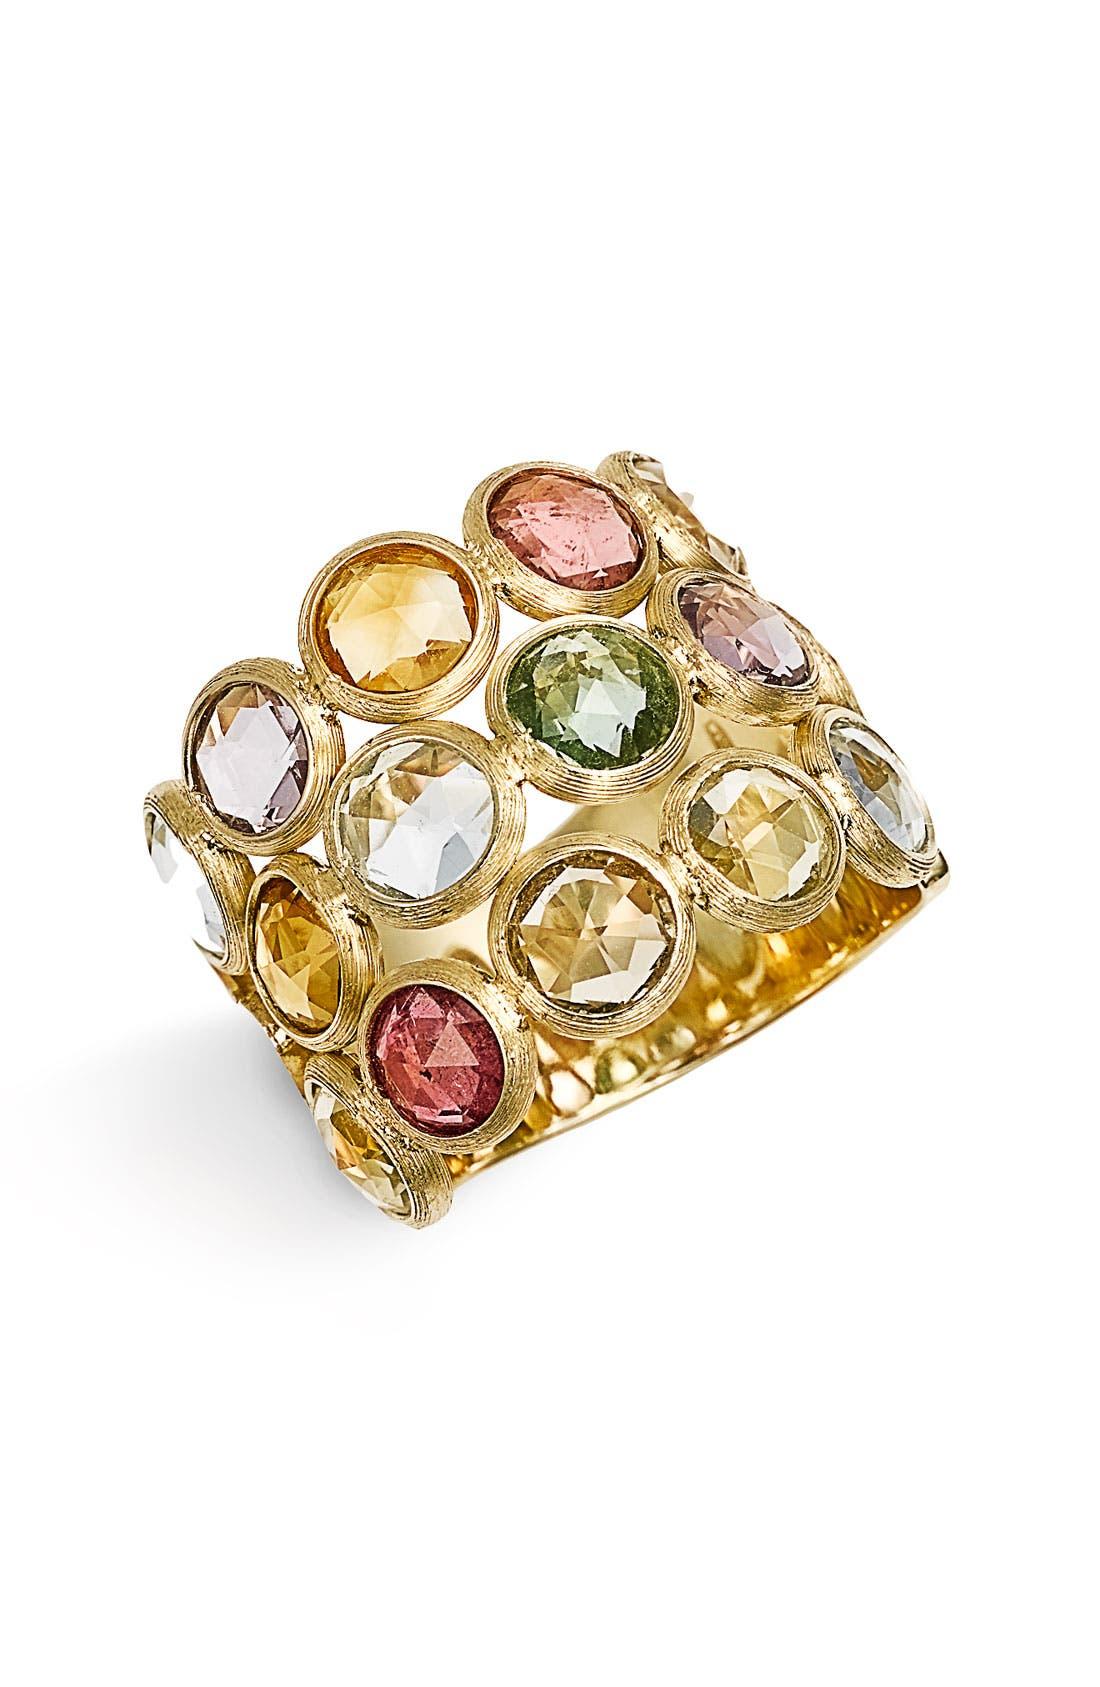 Main Image - Marco Bicego 'Jaipur' Multi Stone Ring